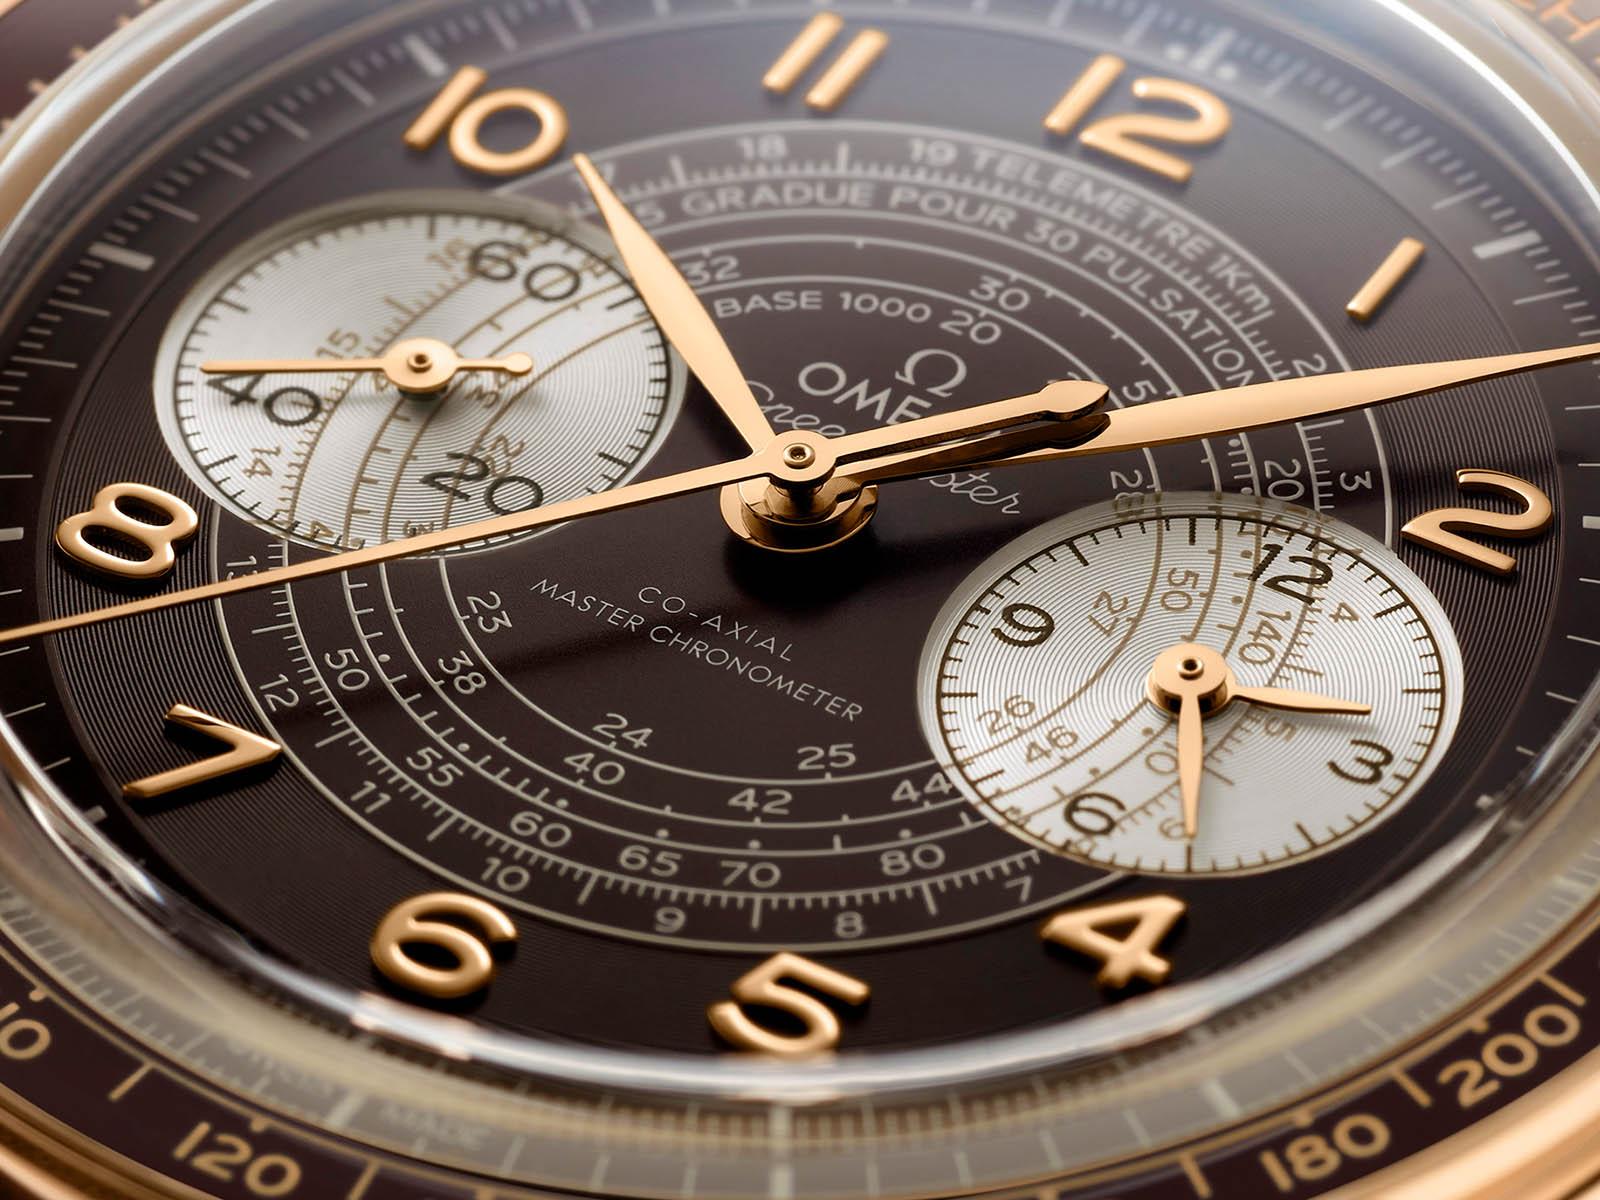 omega-speedmaster-chronoscope-co-axial-master-chronometer-chronograph-6.jpg